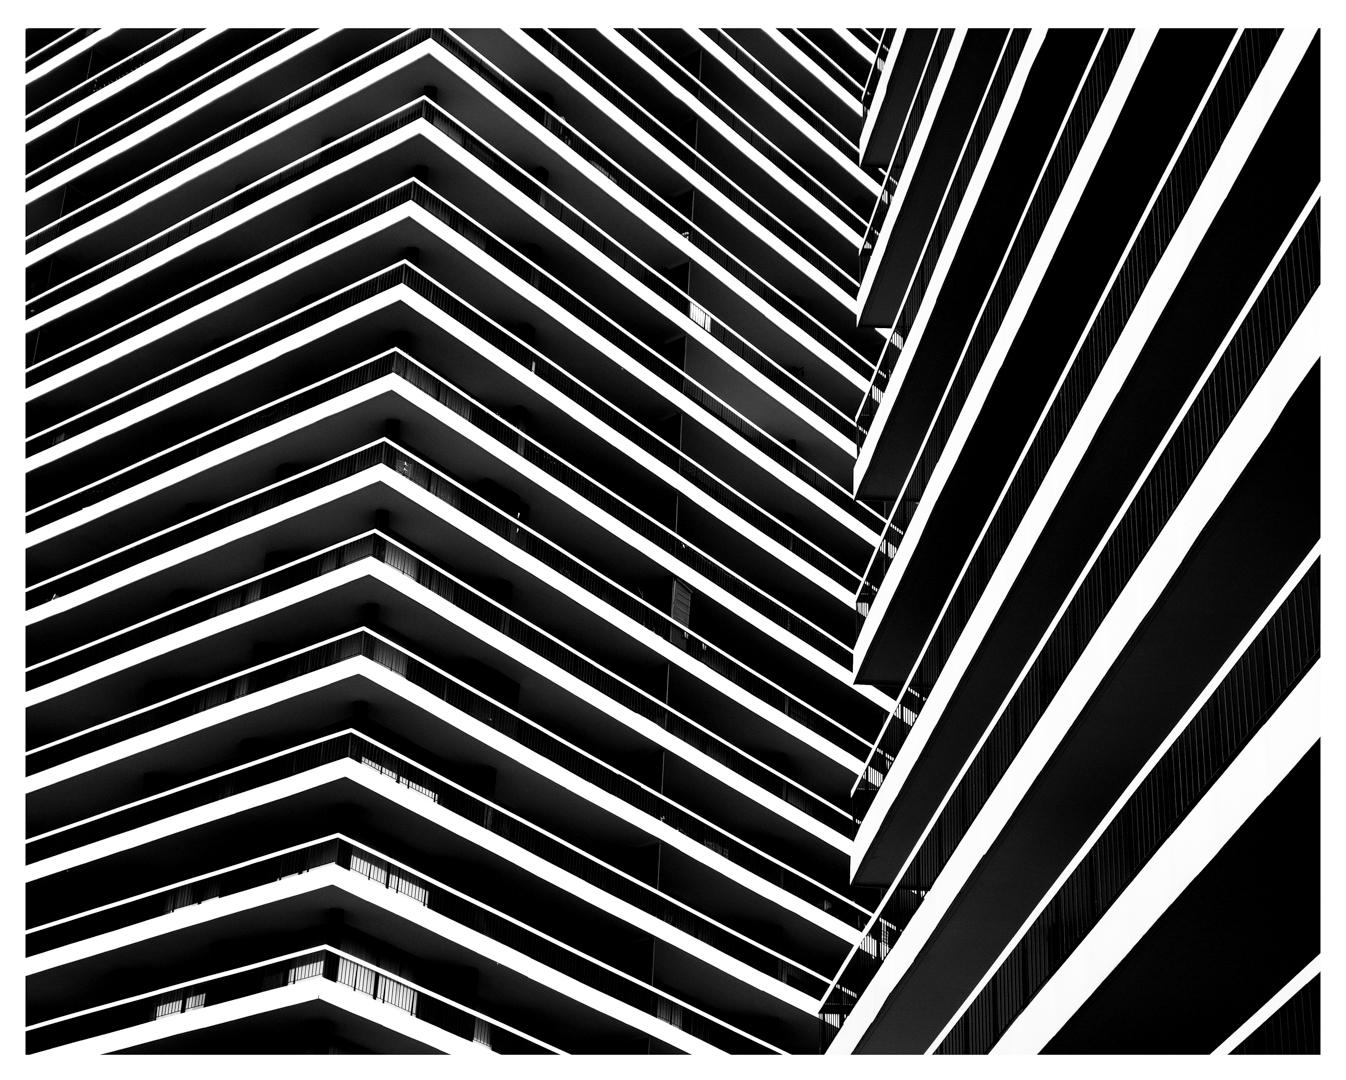 Apartment Towers, North York